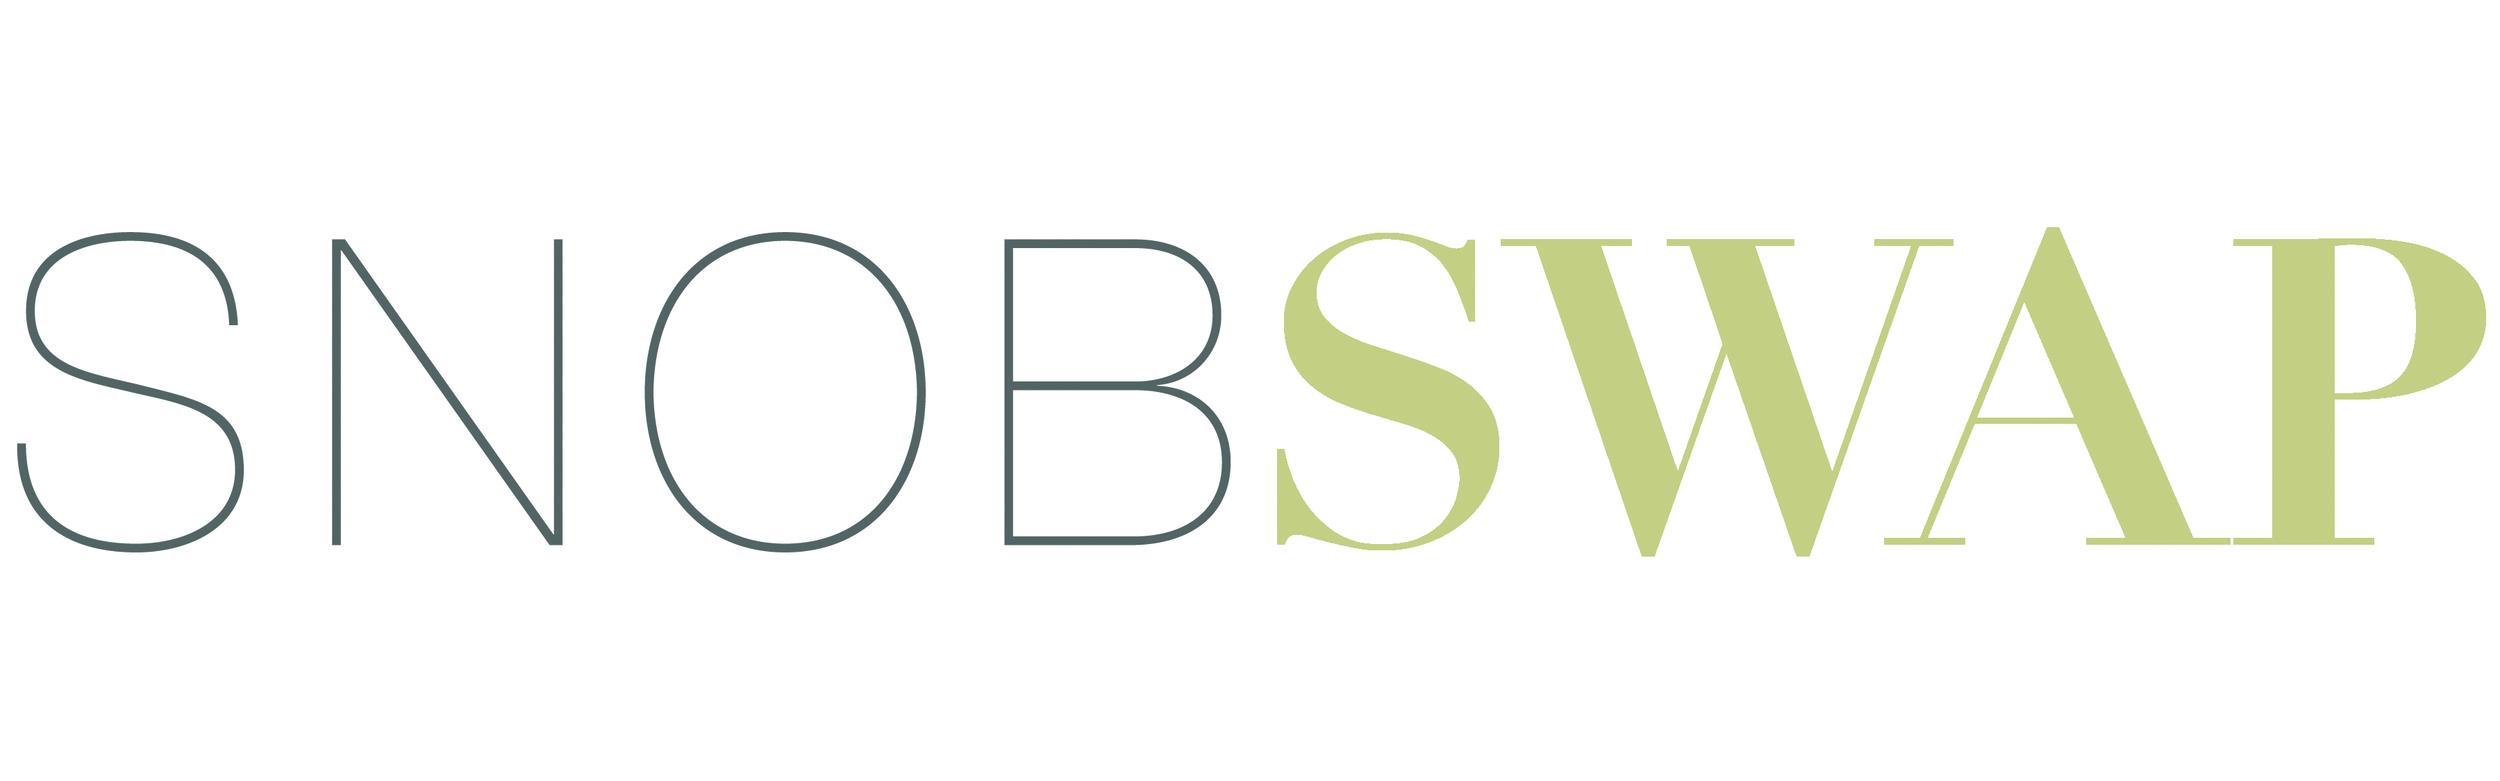 snob-swap-logo.jpg